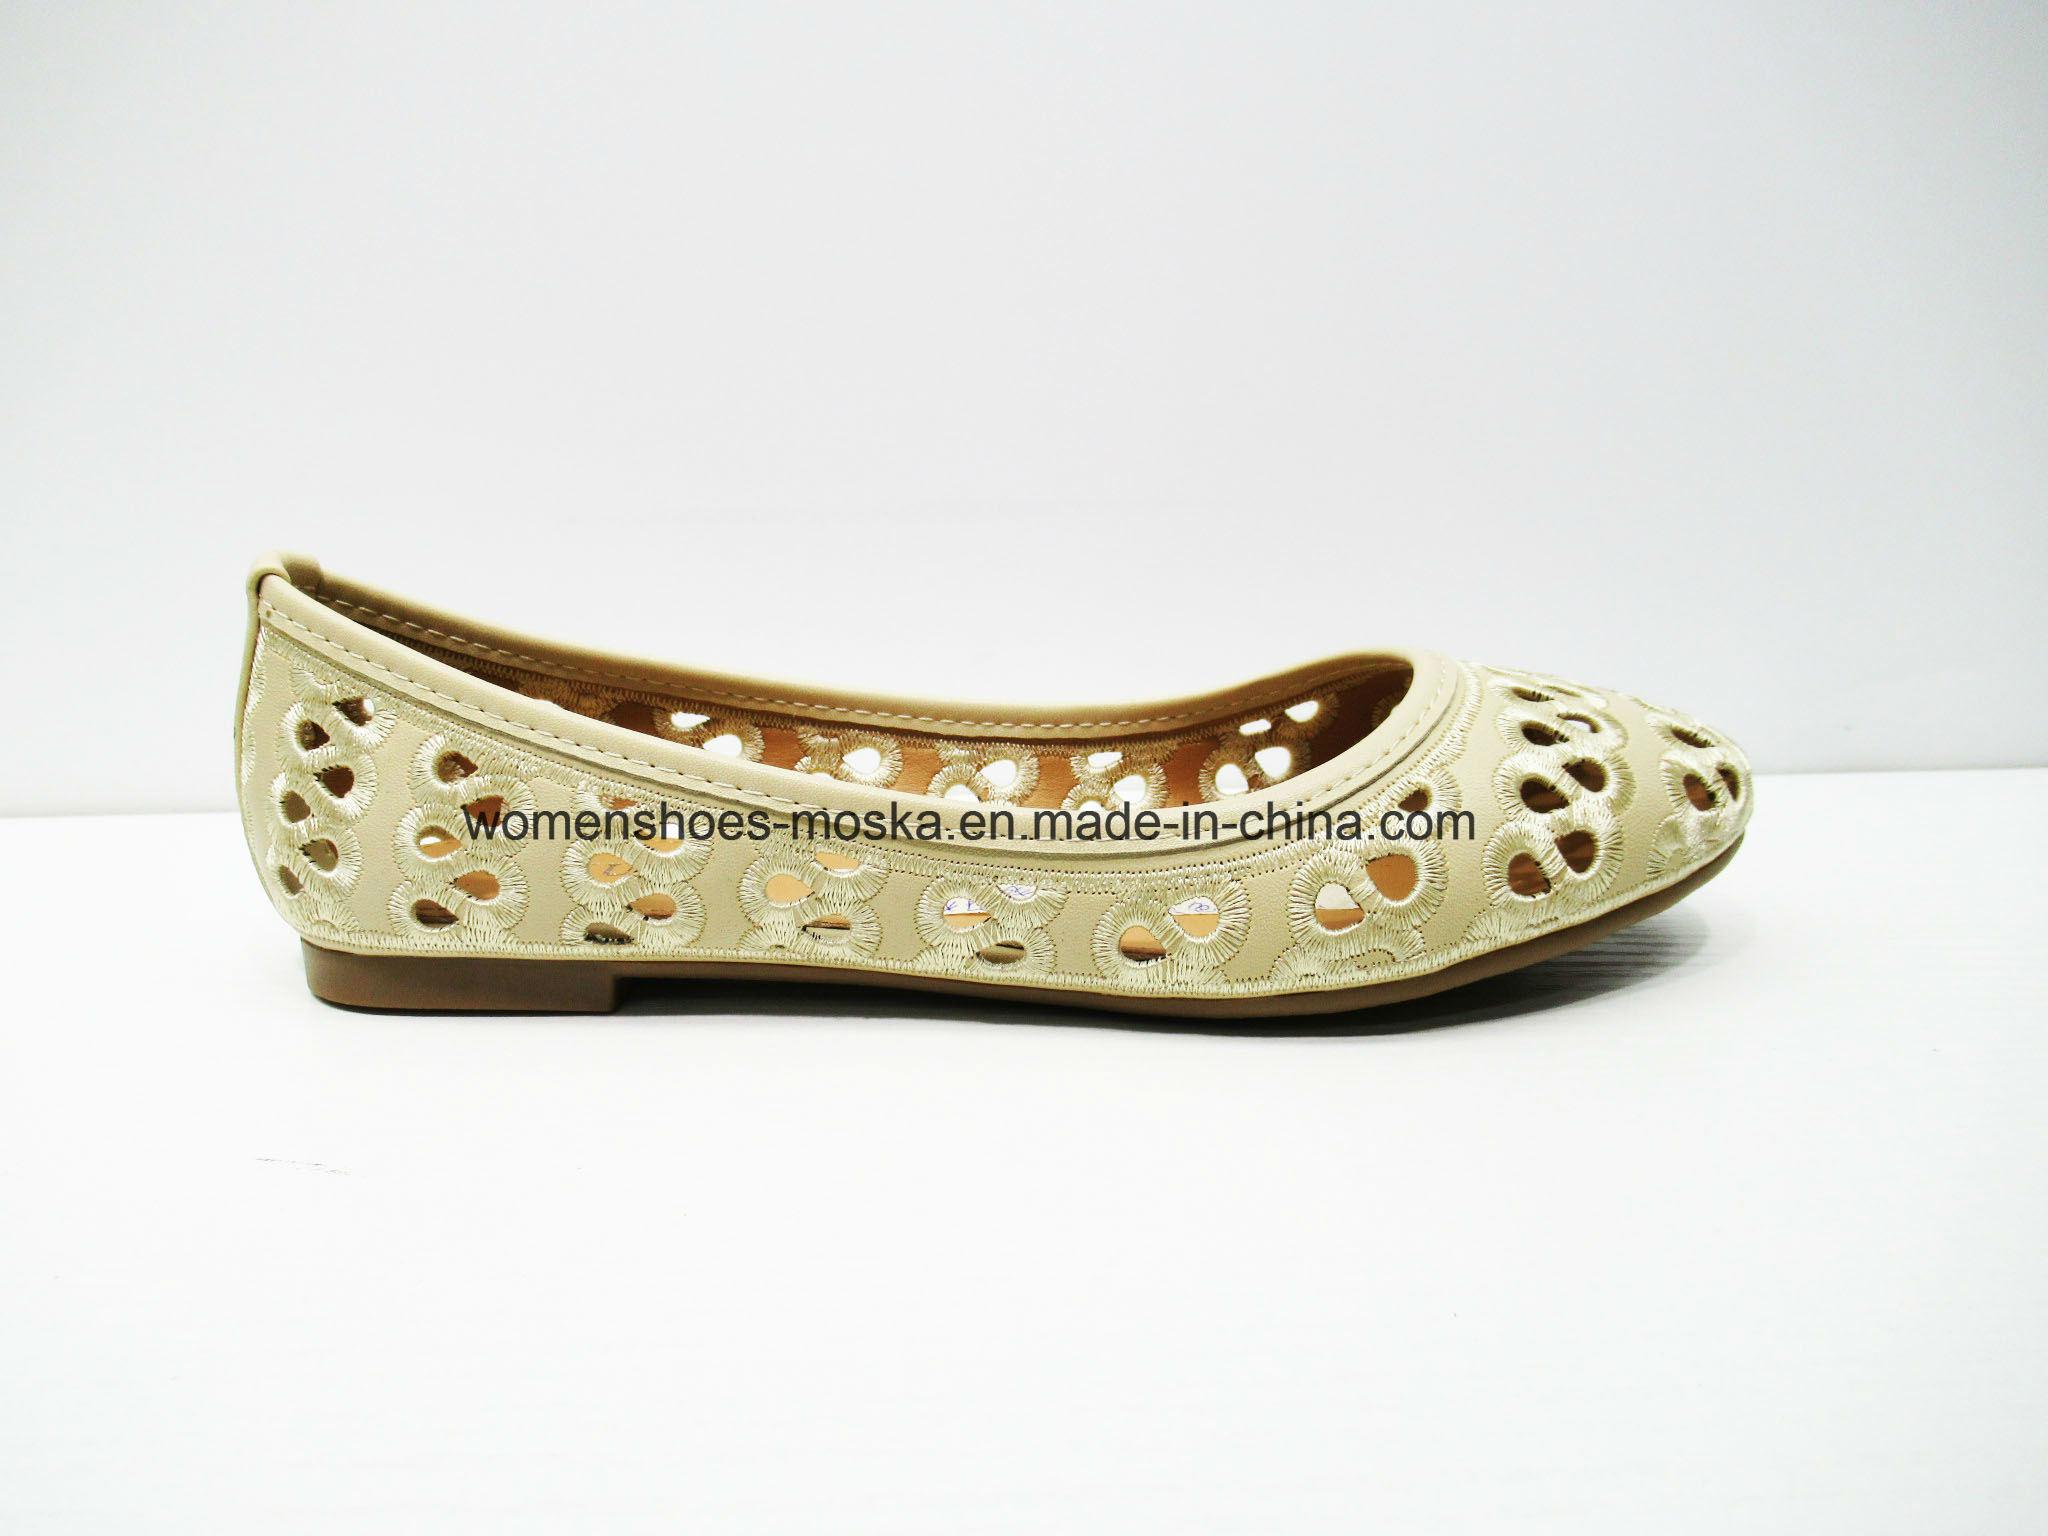 Comfortable Lady Fashion Flat Ballerina Footwear for Leisure